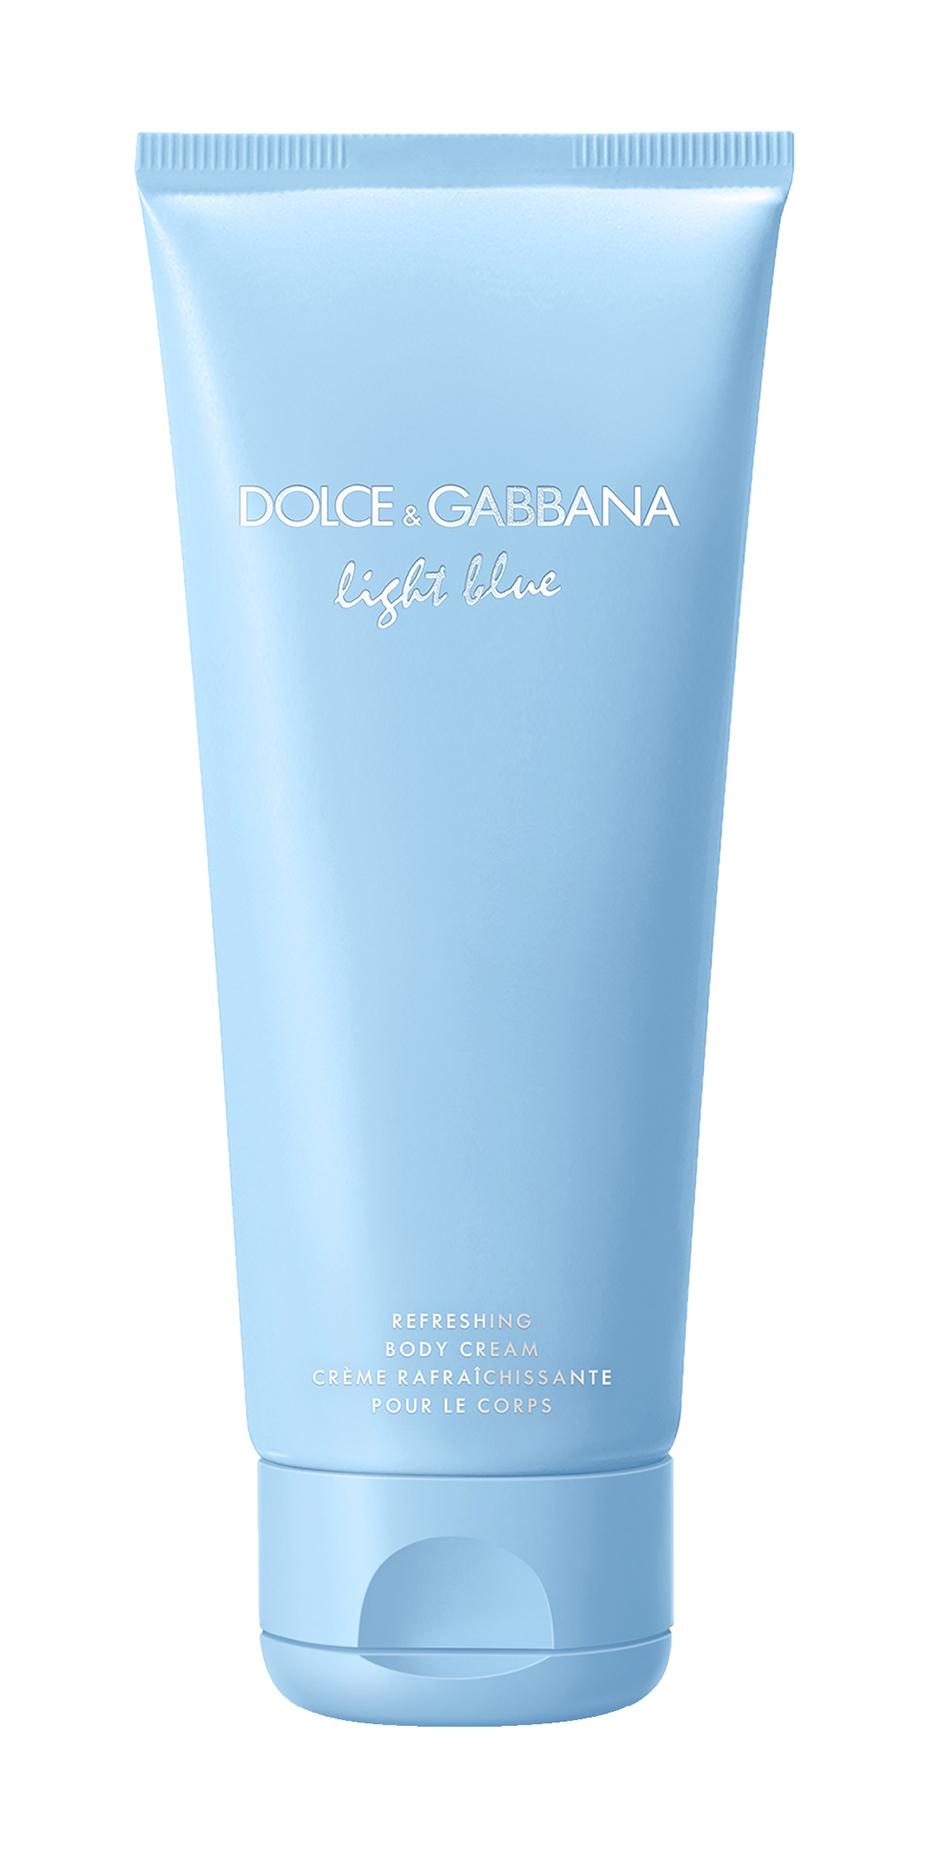 Купить Крем для тела Dolce & Gabbana Light Blue Refreshing Body Cream, DOLCE&GABBANA